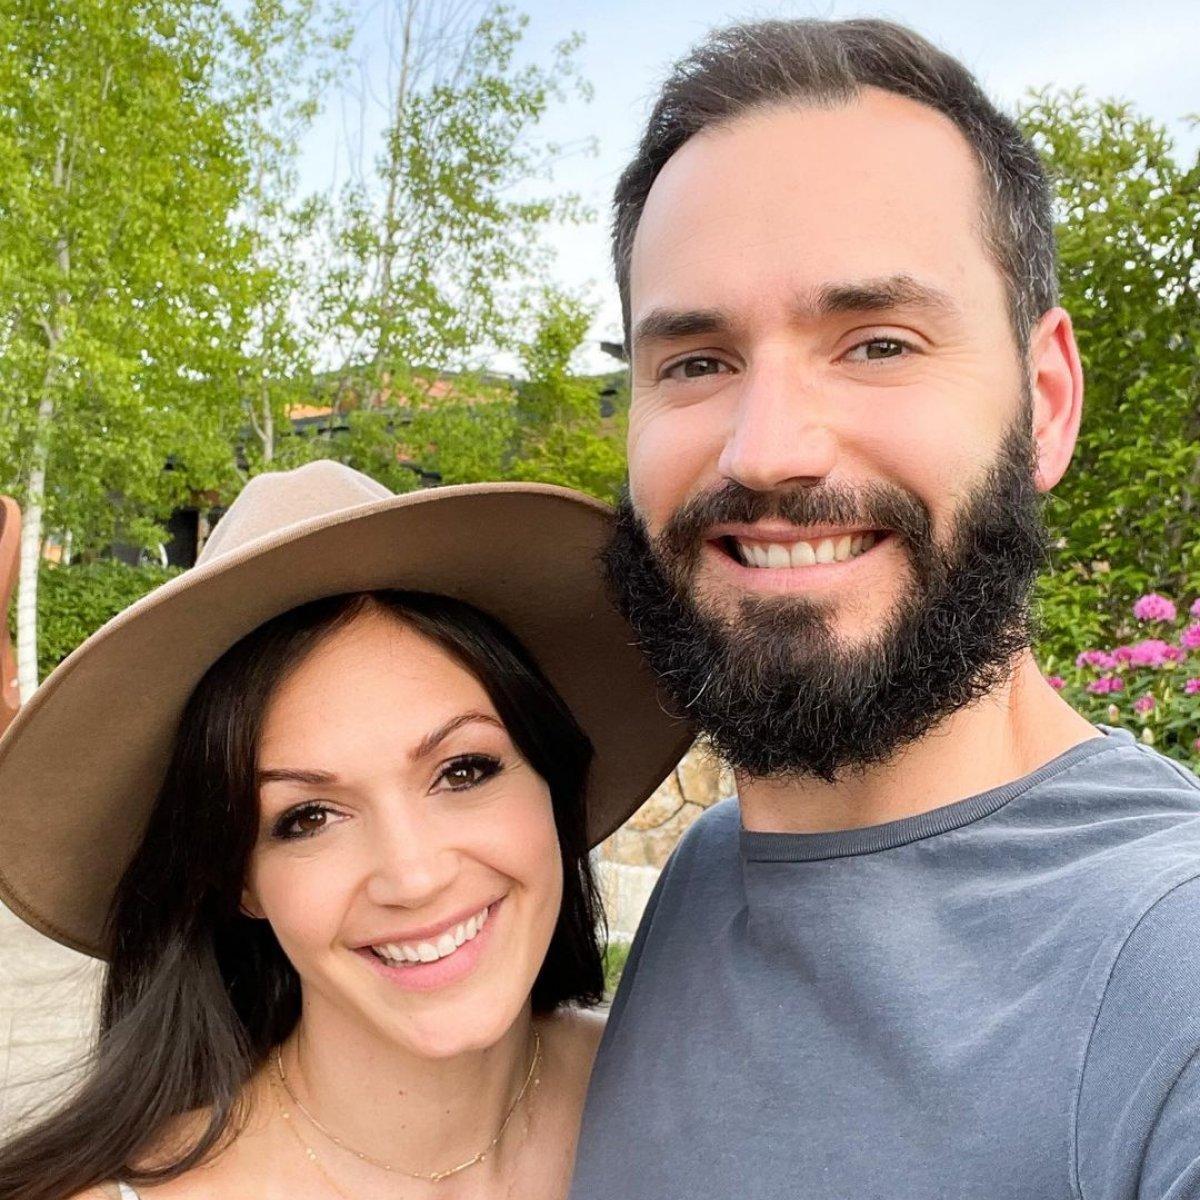 desiree hartsock and chris siegfried millionaire dating